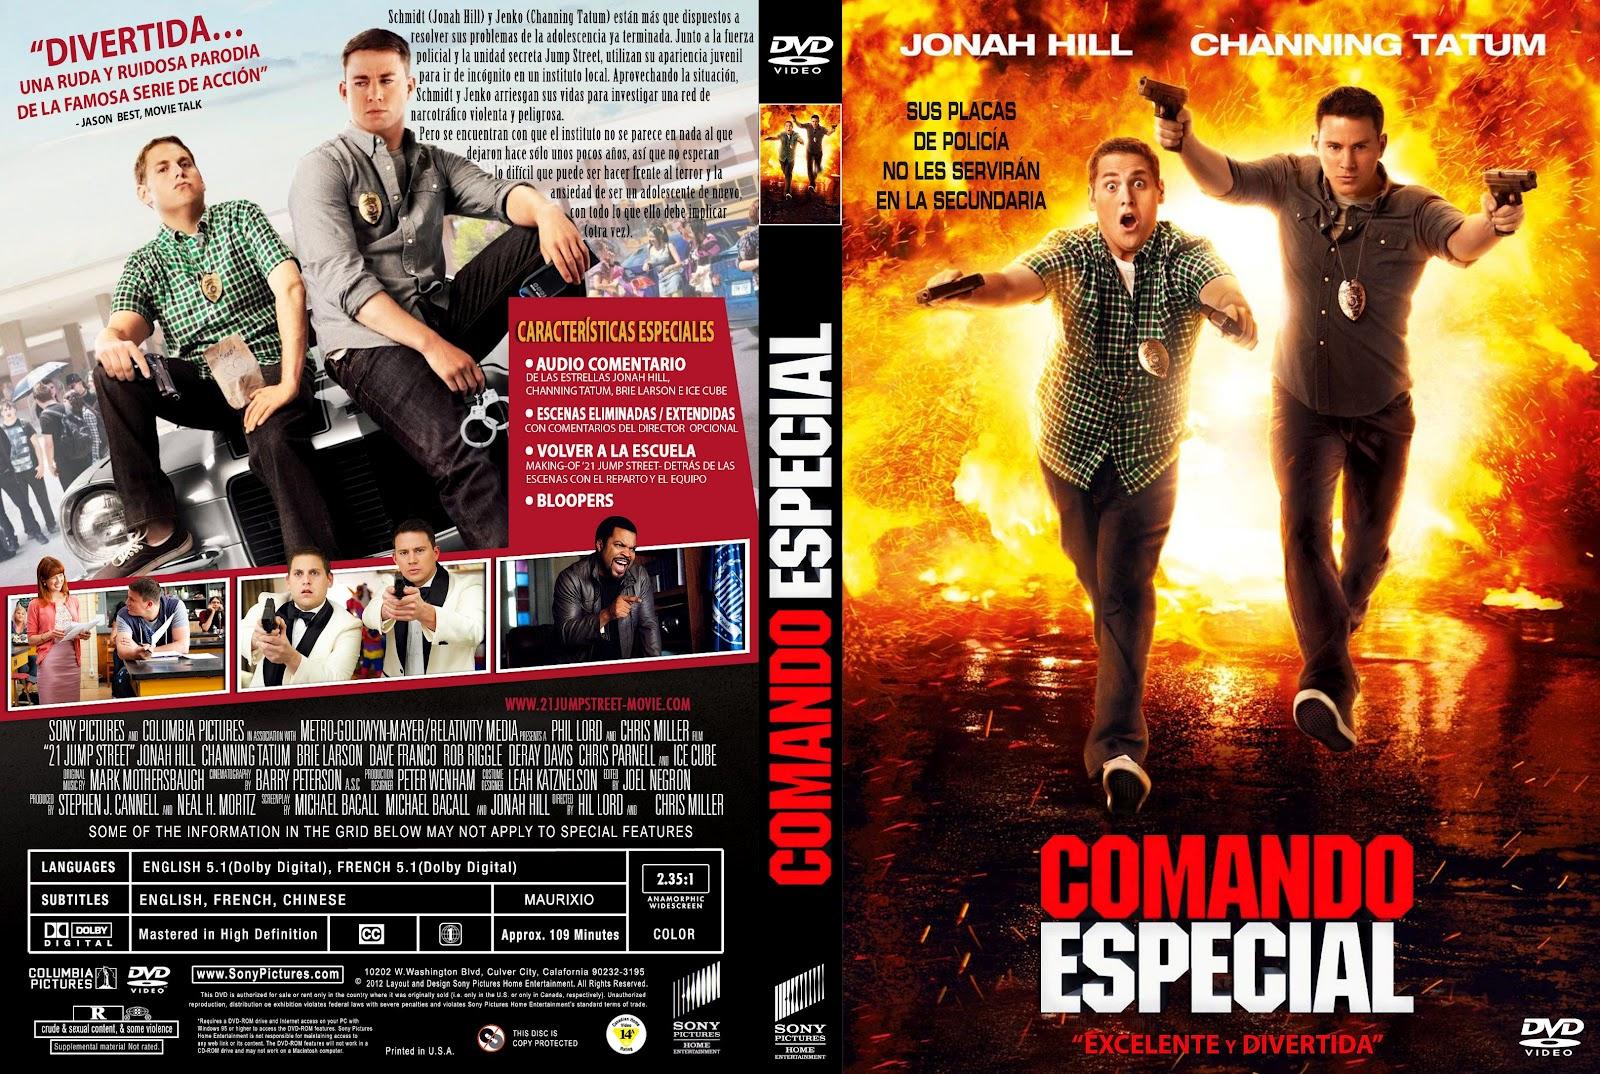 http://3.bp.blogspot.com/-gyHjU2JTbYs/T9YMUYyfuPI/AAAAAAAACVU/3z8mTRO3zXc/s1600/Comando+Especial+Custom+Por+Sorete22+-+dvd.jpg